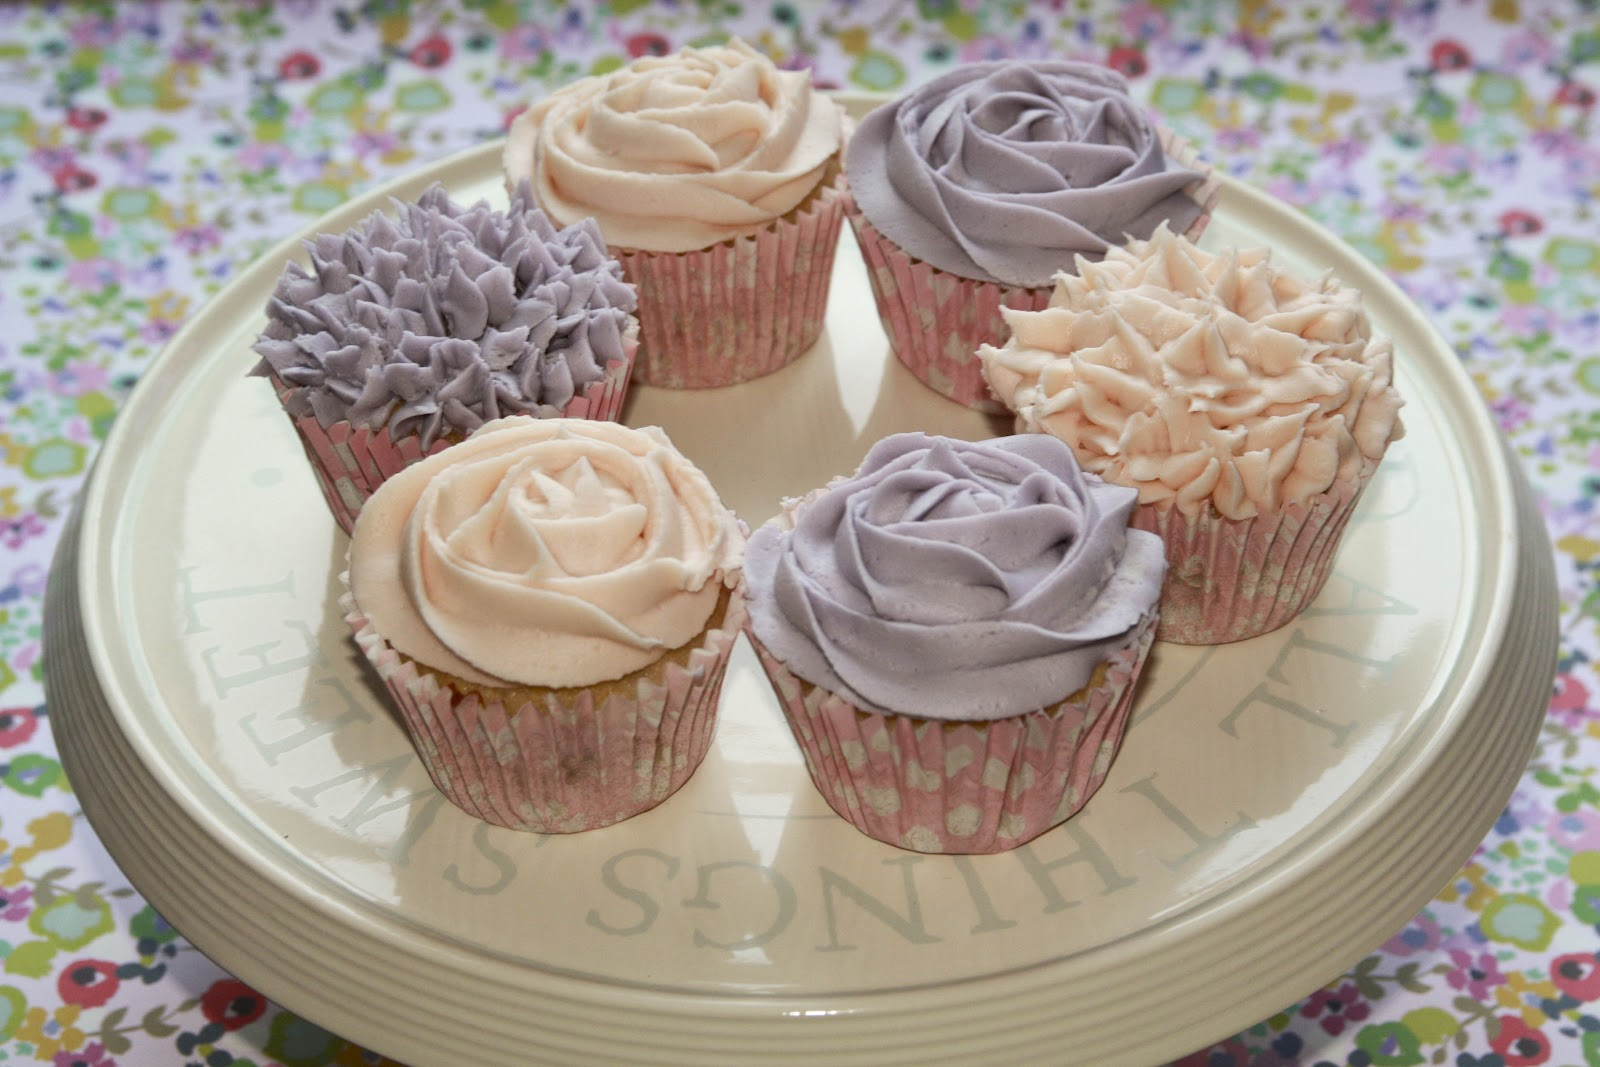 rhubarb cupcakes, sloe gin cupcakes, buttercream, buttercream flowers ...